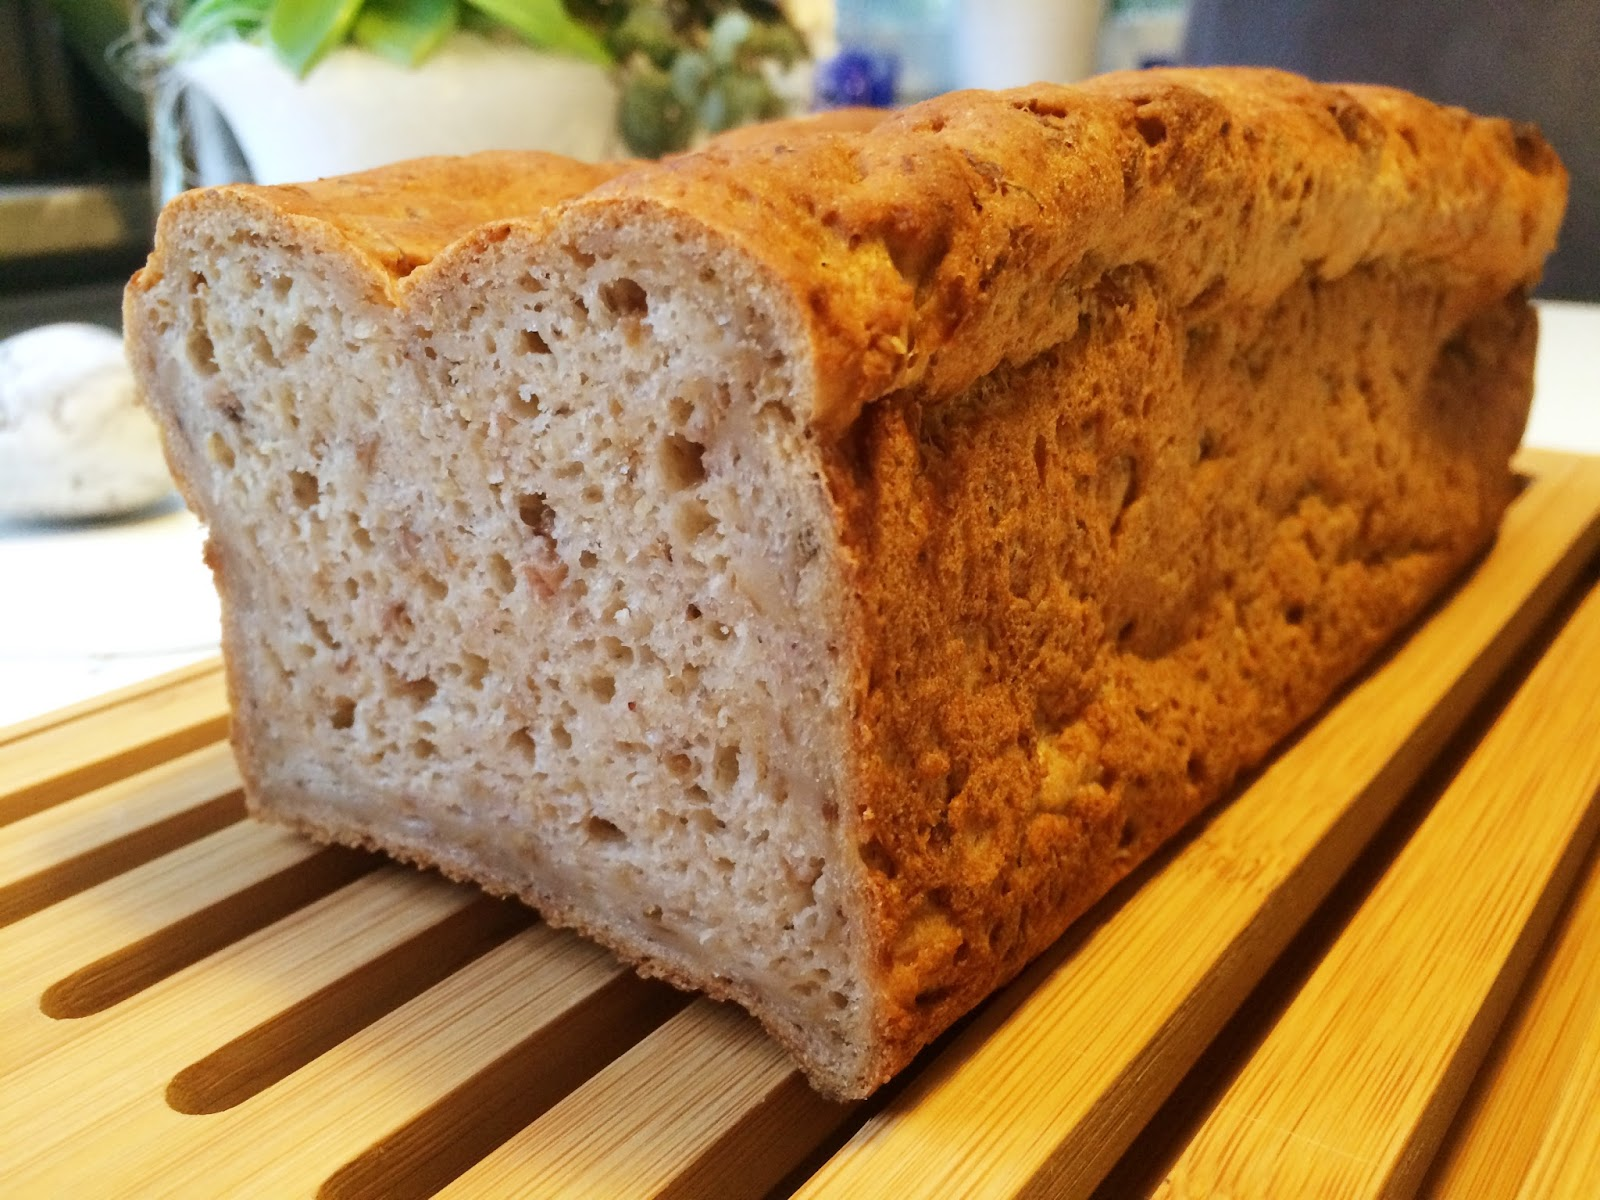 baka bröd med creme fraiche